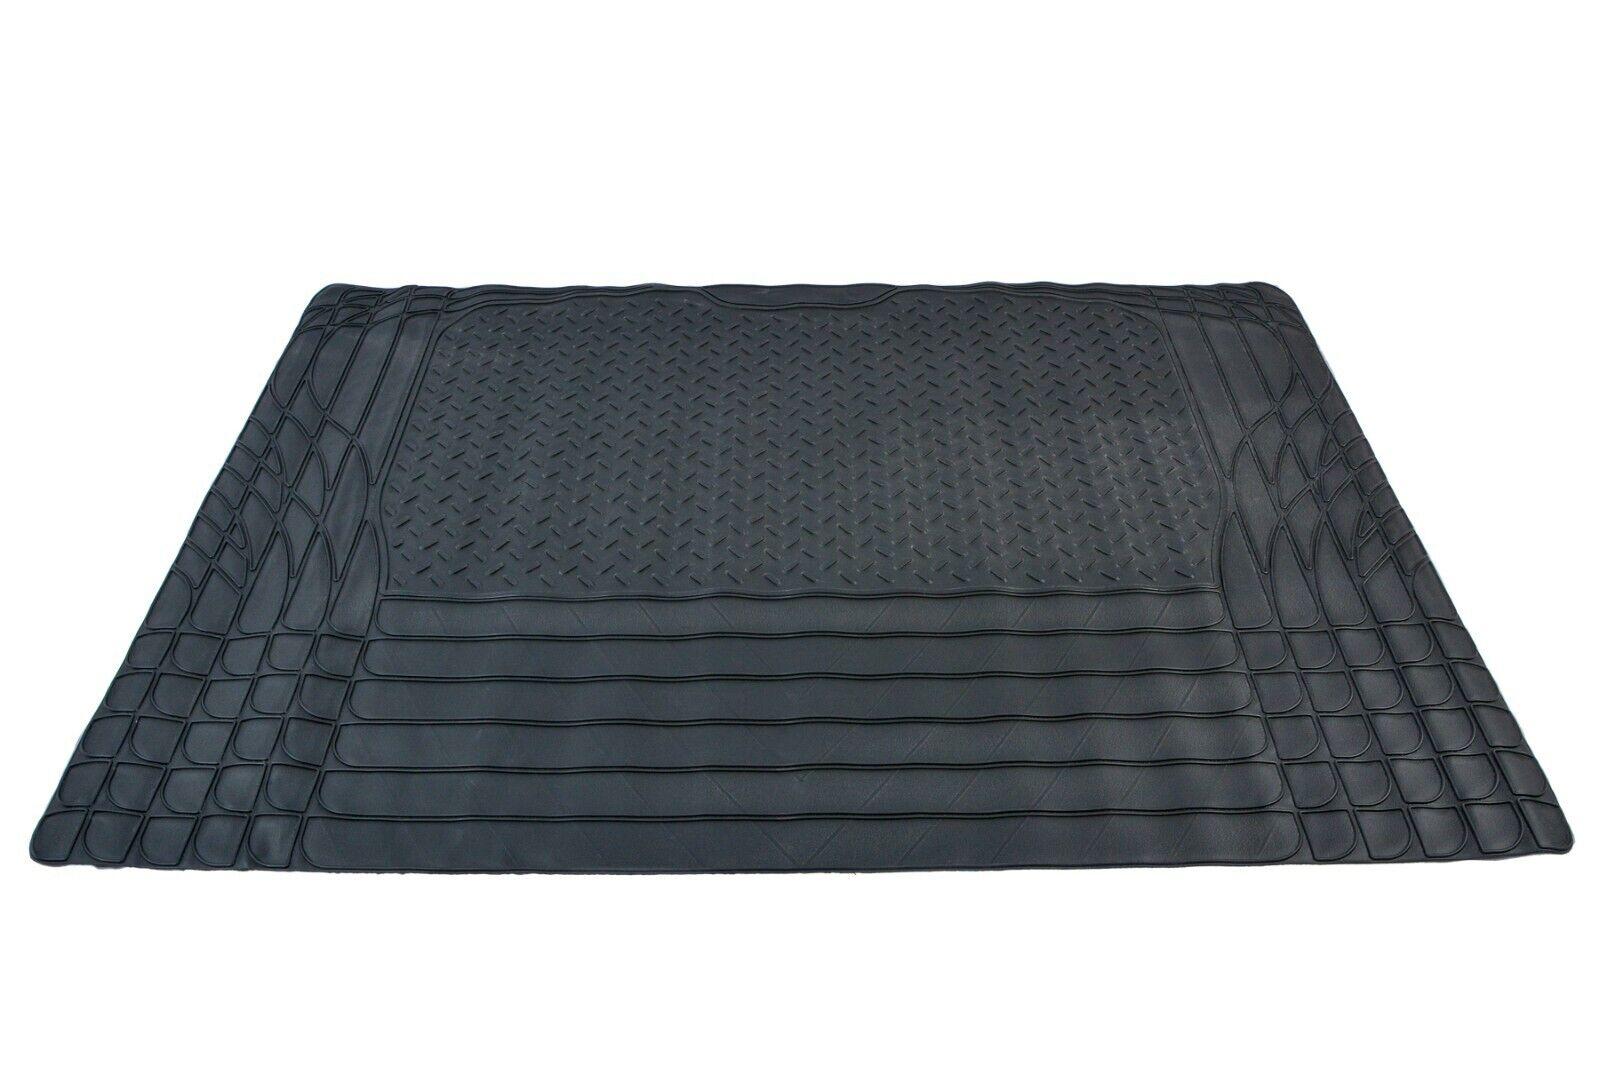 Car Parts - Universal Car Boot Mat Rubber Non Slip Large Lightweight 120 x 80 CM